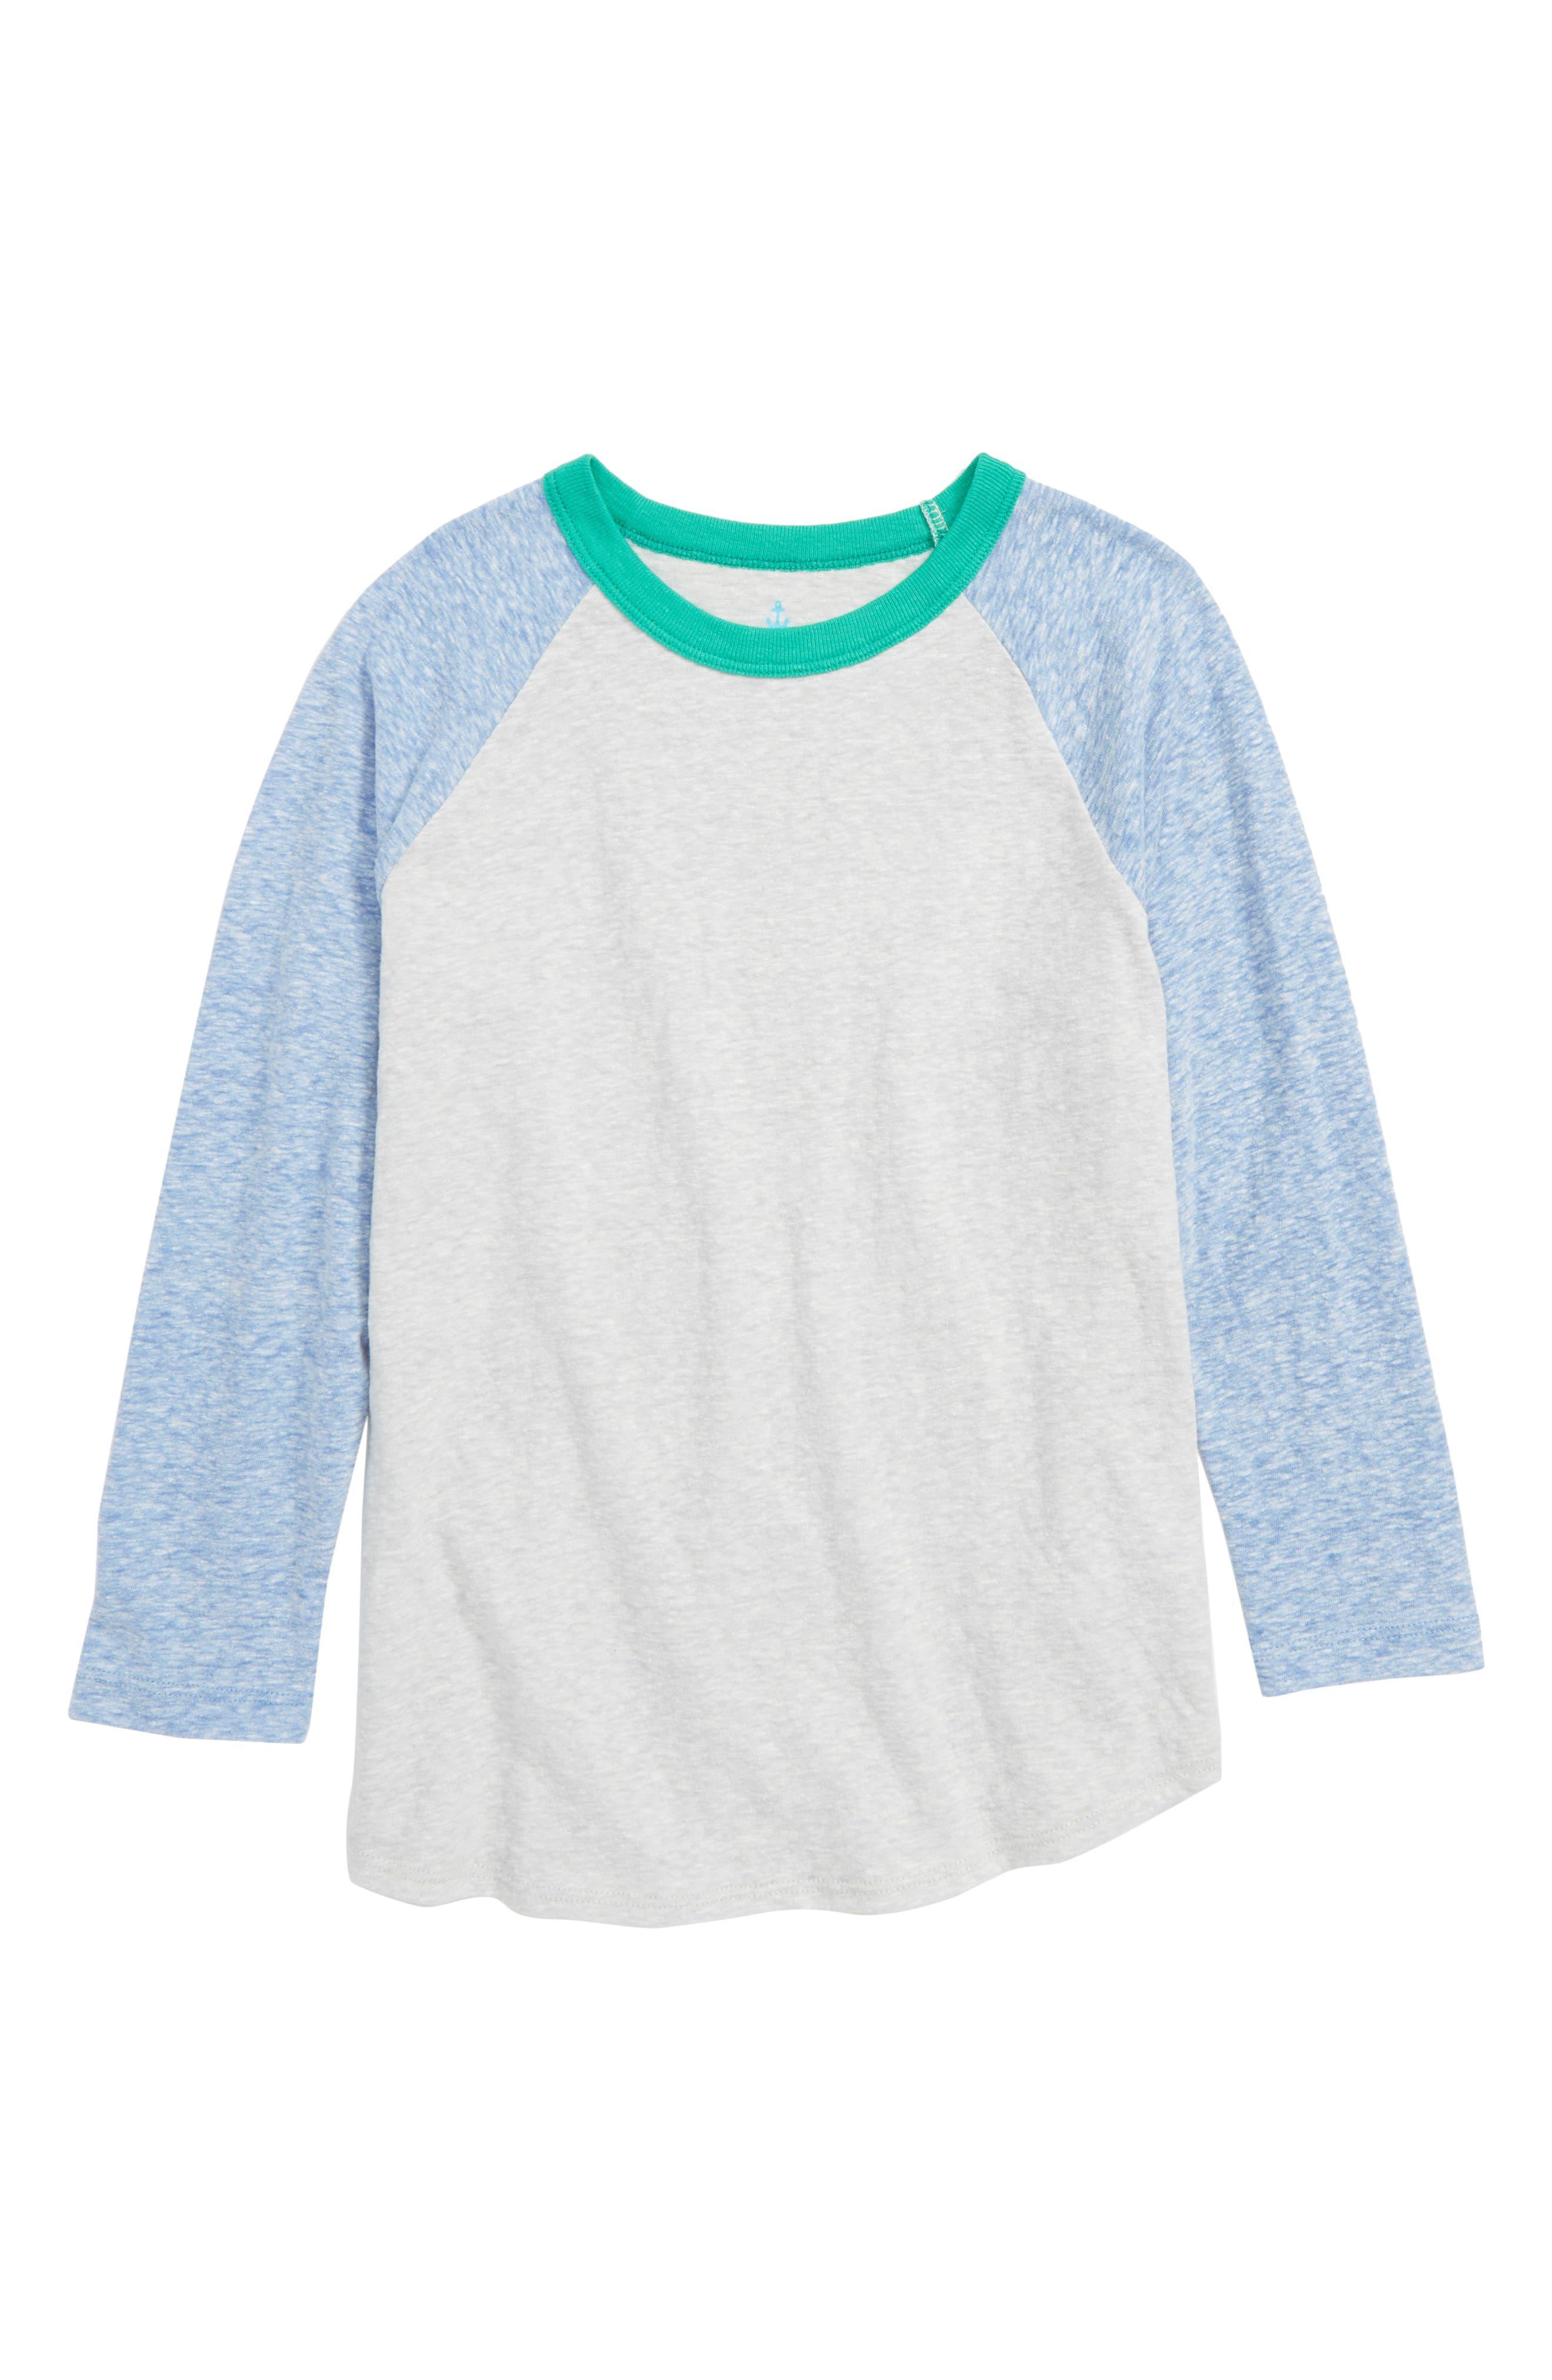 CREWCUTS BY J.CREW Jersey Baseball T-Shirt, Main, color, 020